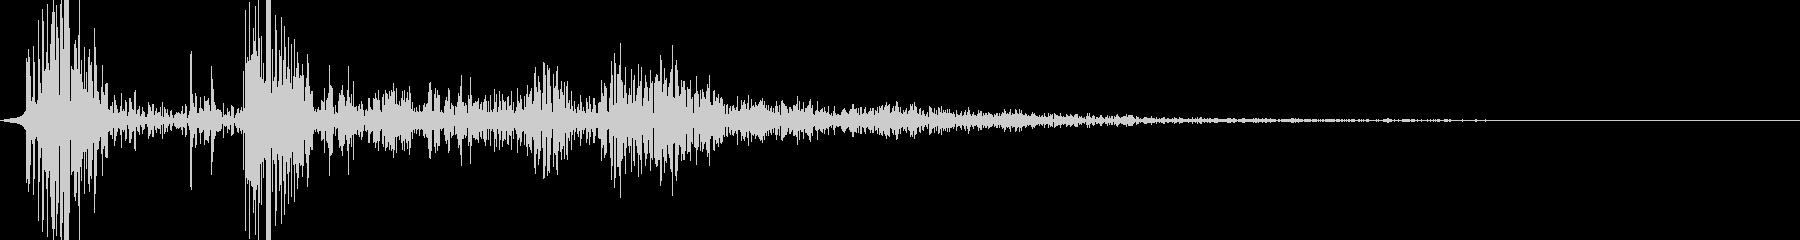 Gunshot_single shot (pan)'s unreproduced waveform